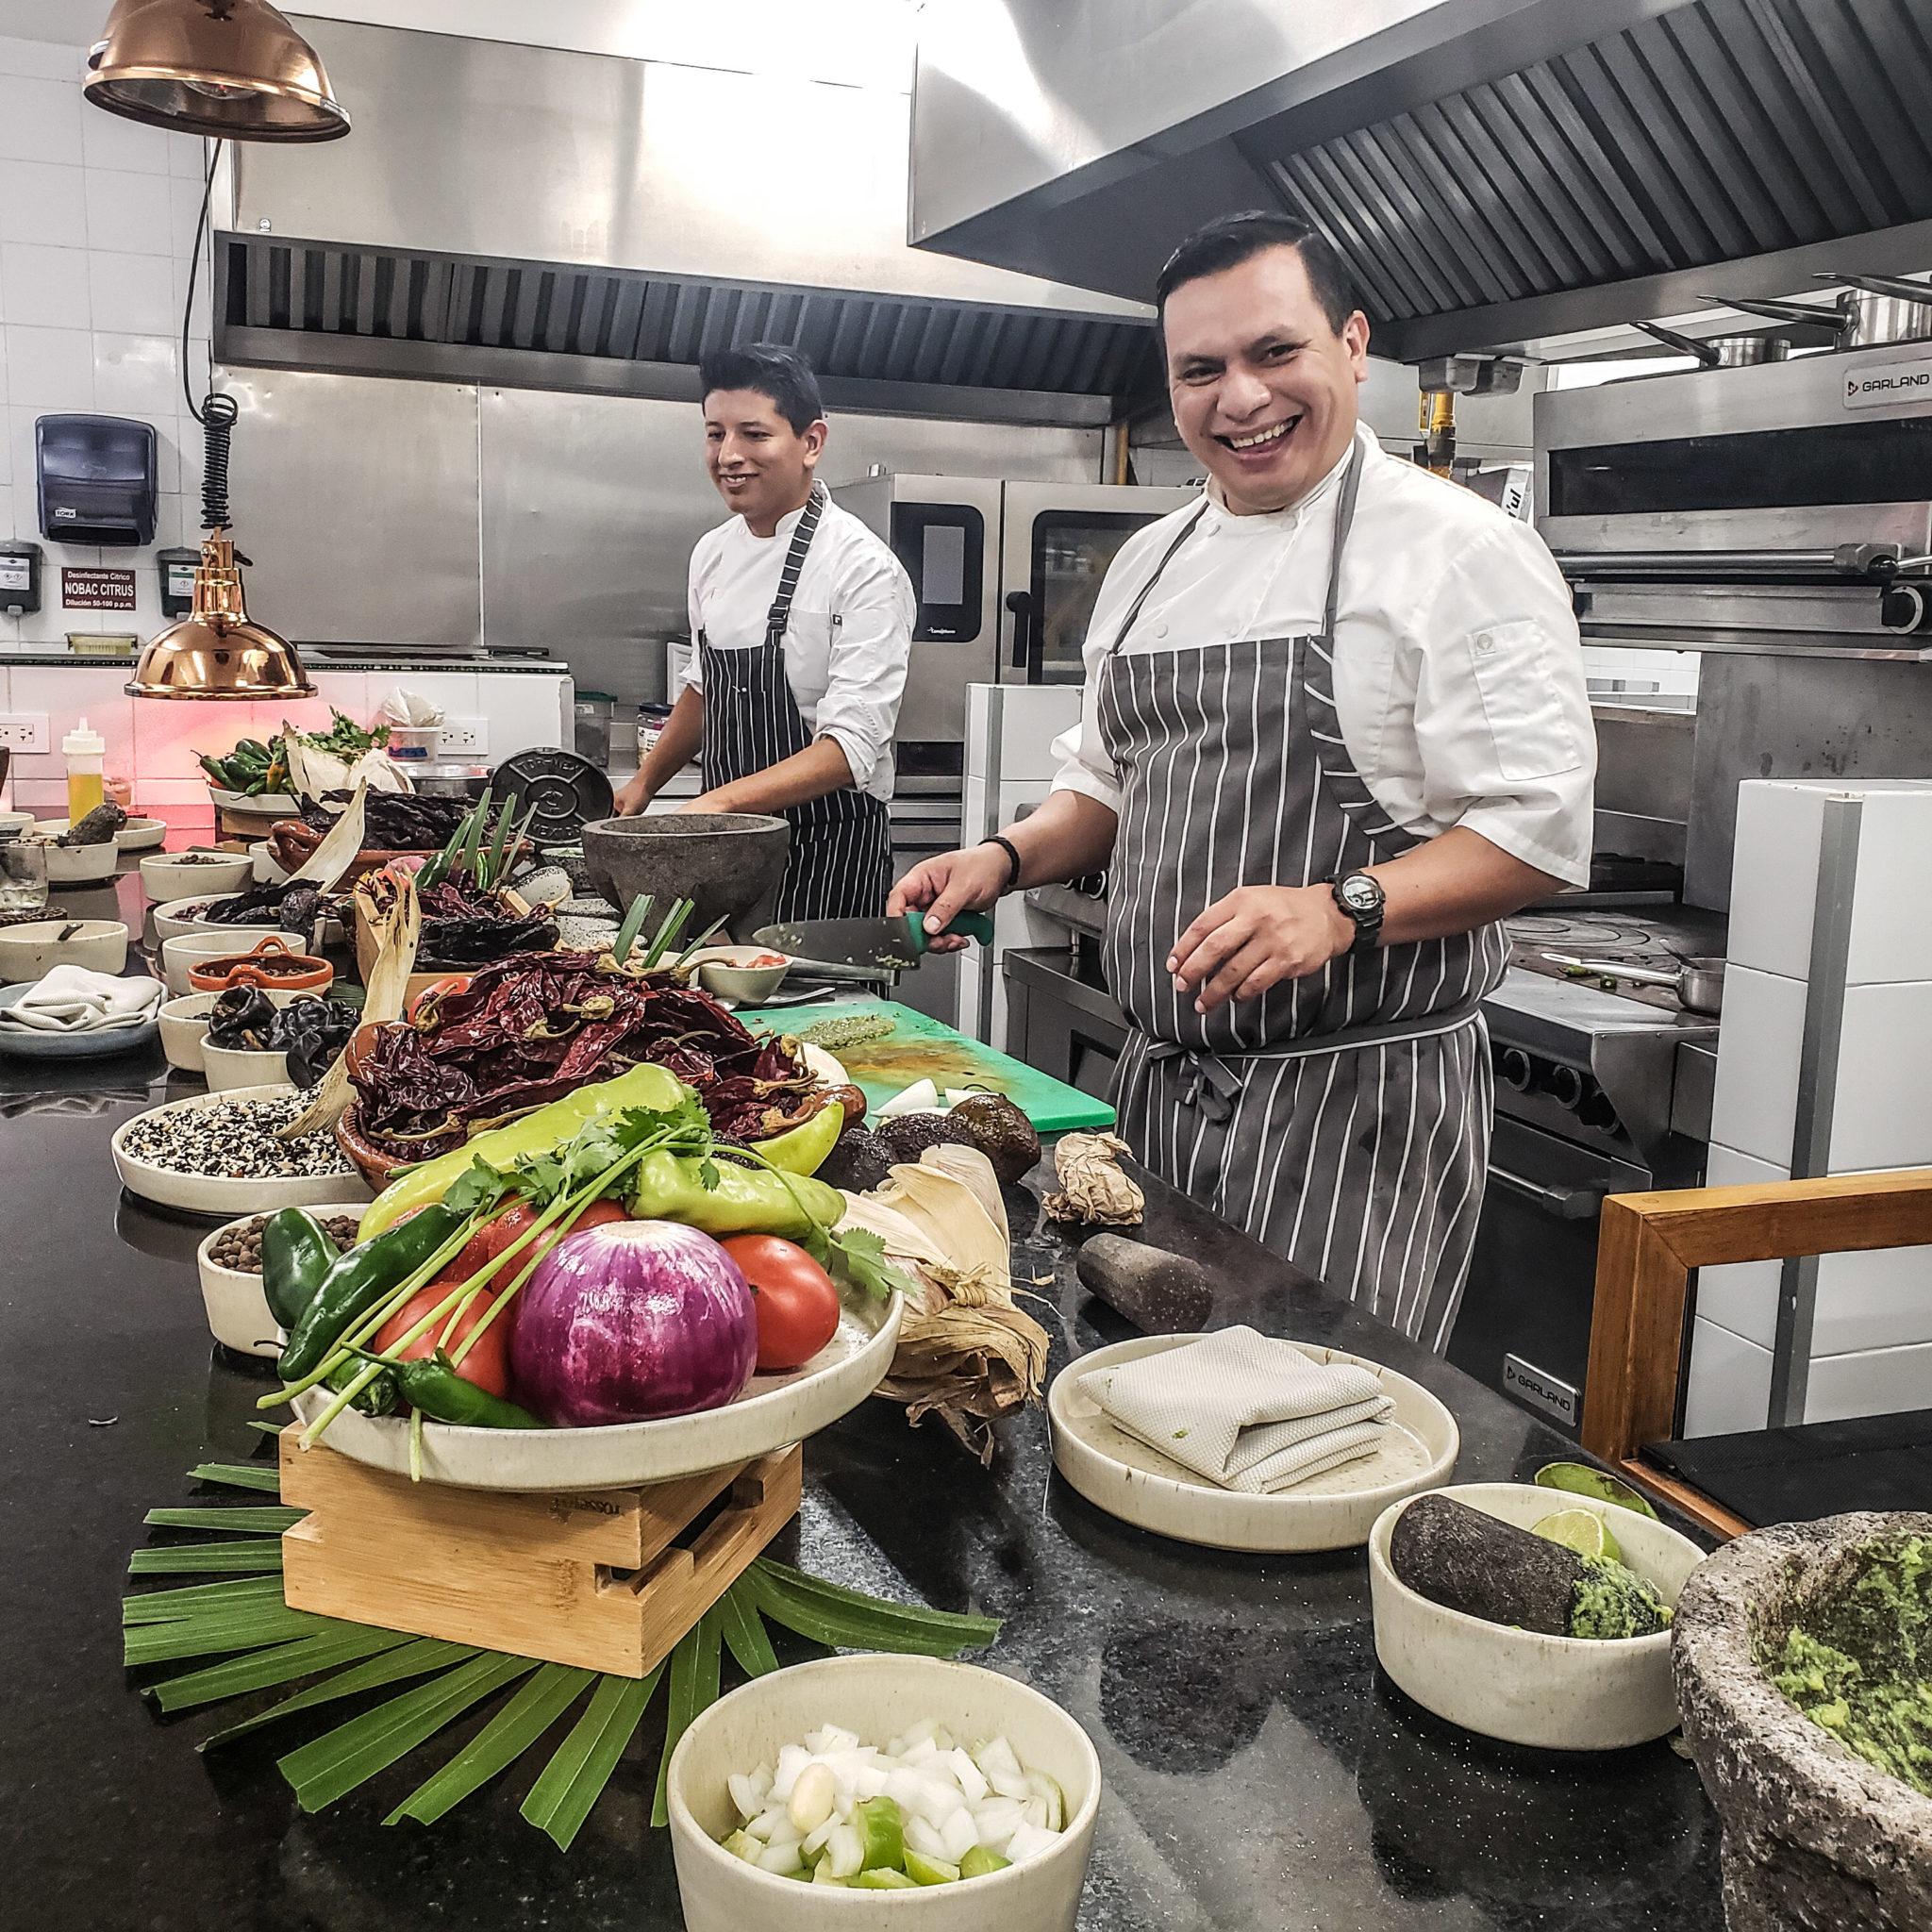 Chable Maroma Resort - Quintana Roo - Playa Del Carmen - Playa Maroma - Cooking Class